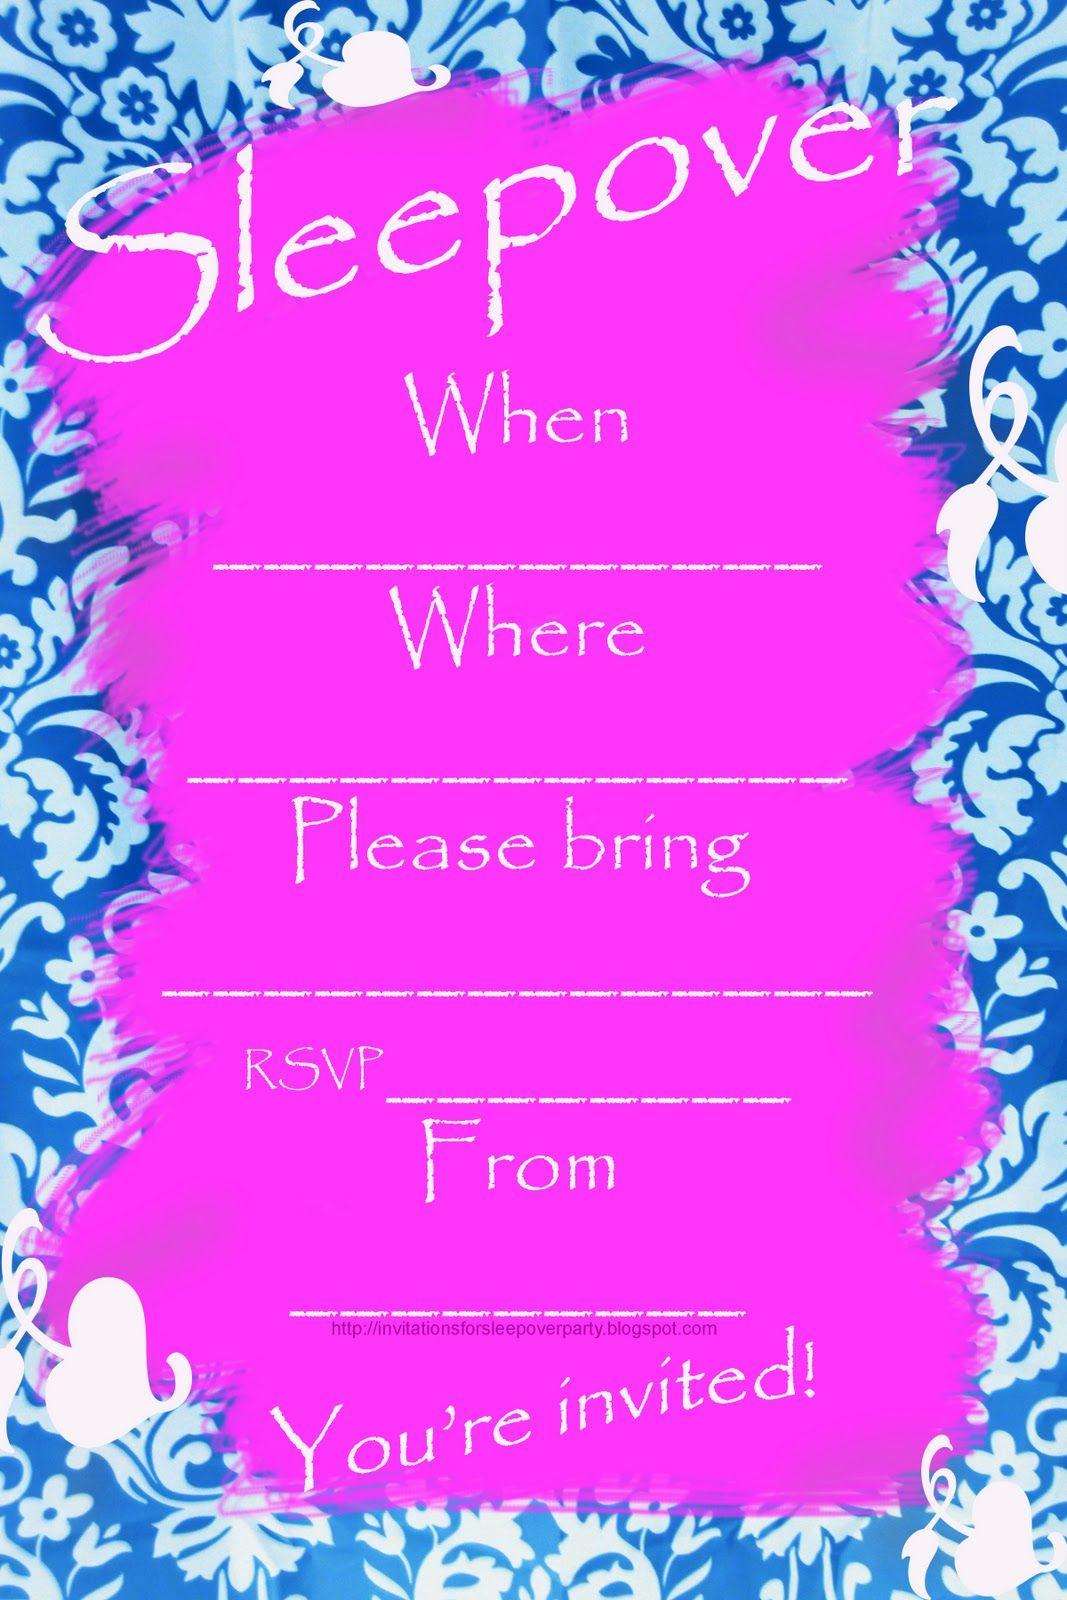 Girls Sleepover Birthday Party Invitations Sweet13 bday ideas